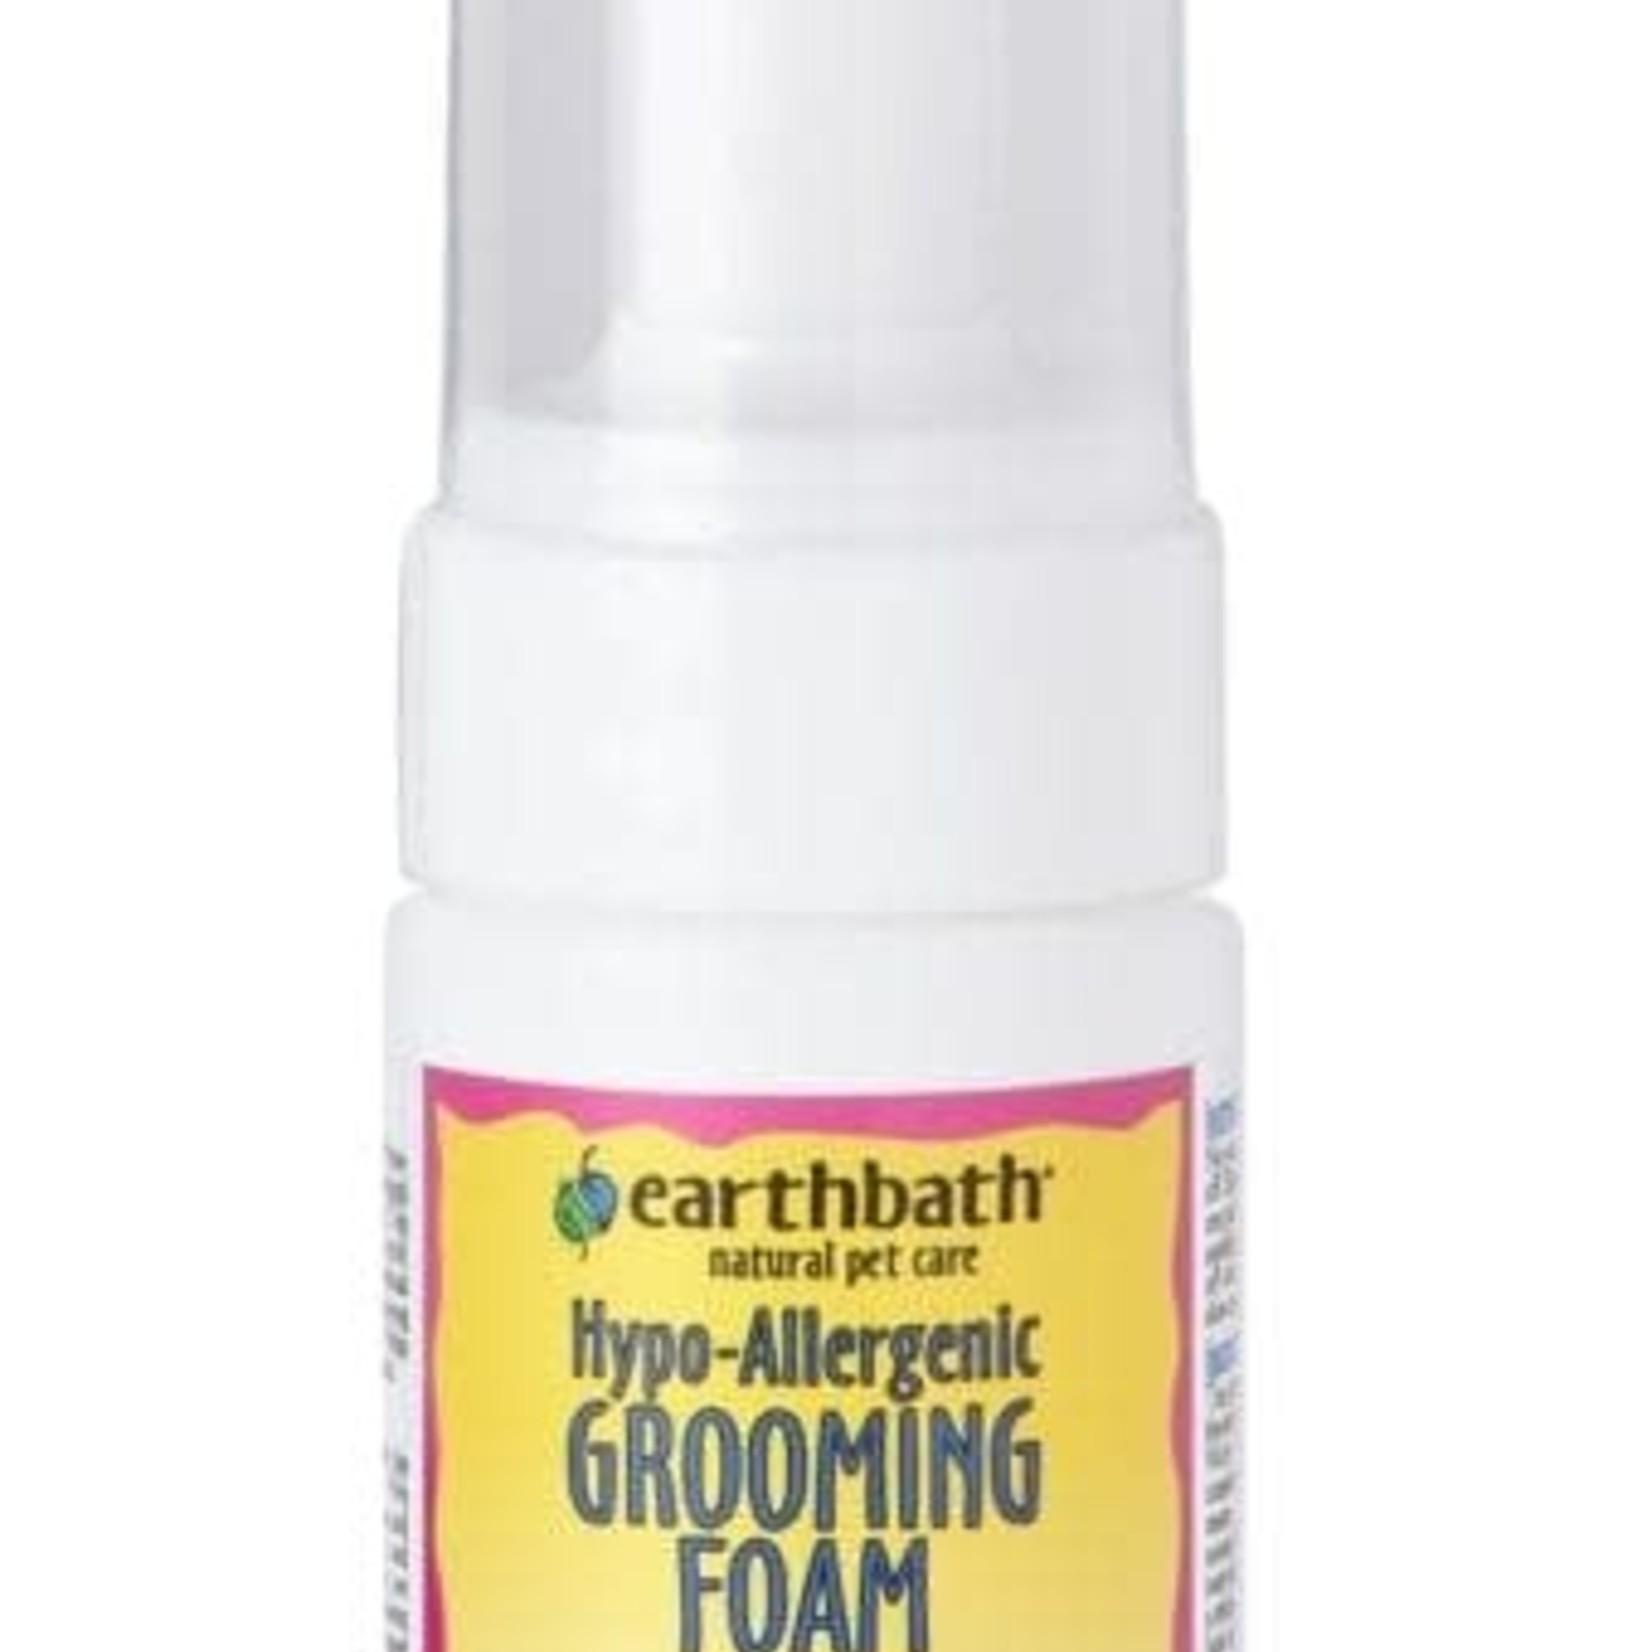 Earth Bath / Shea Pet Earth Bath Cat Grooming Foam Hypo-Allergenic 4 OZ